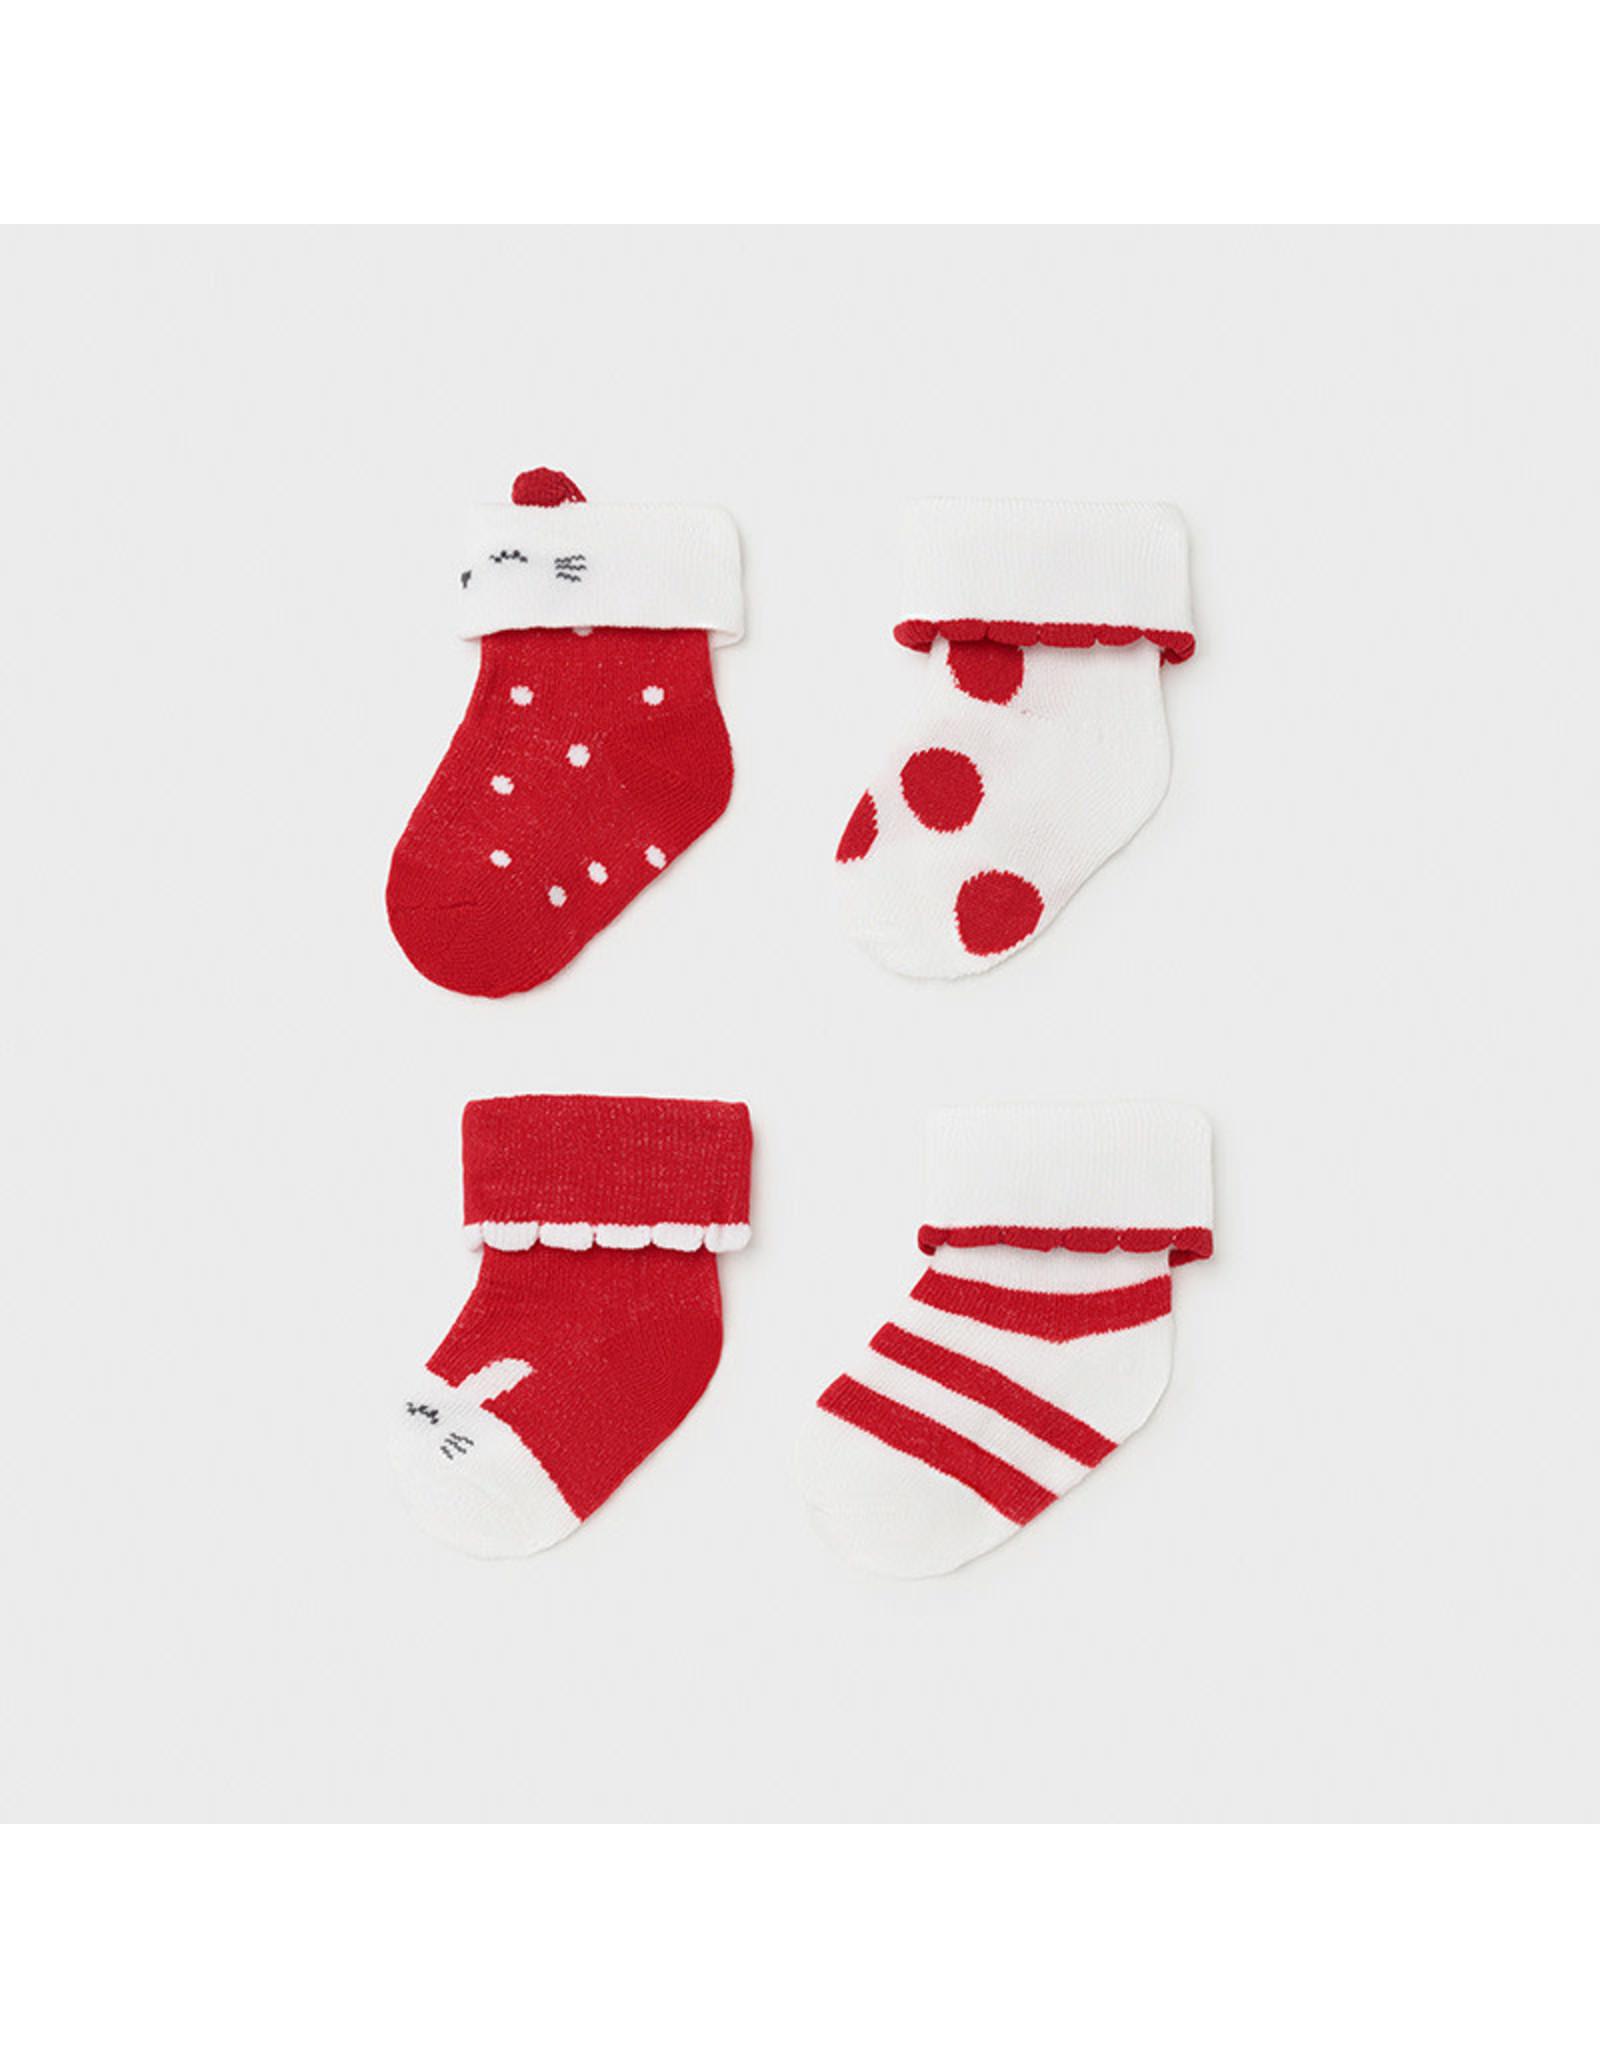 Mayoral 4 Piece Set Socks - Red